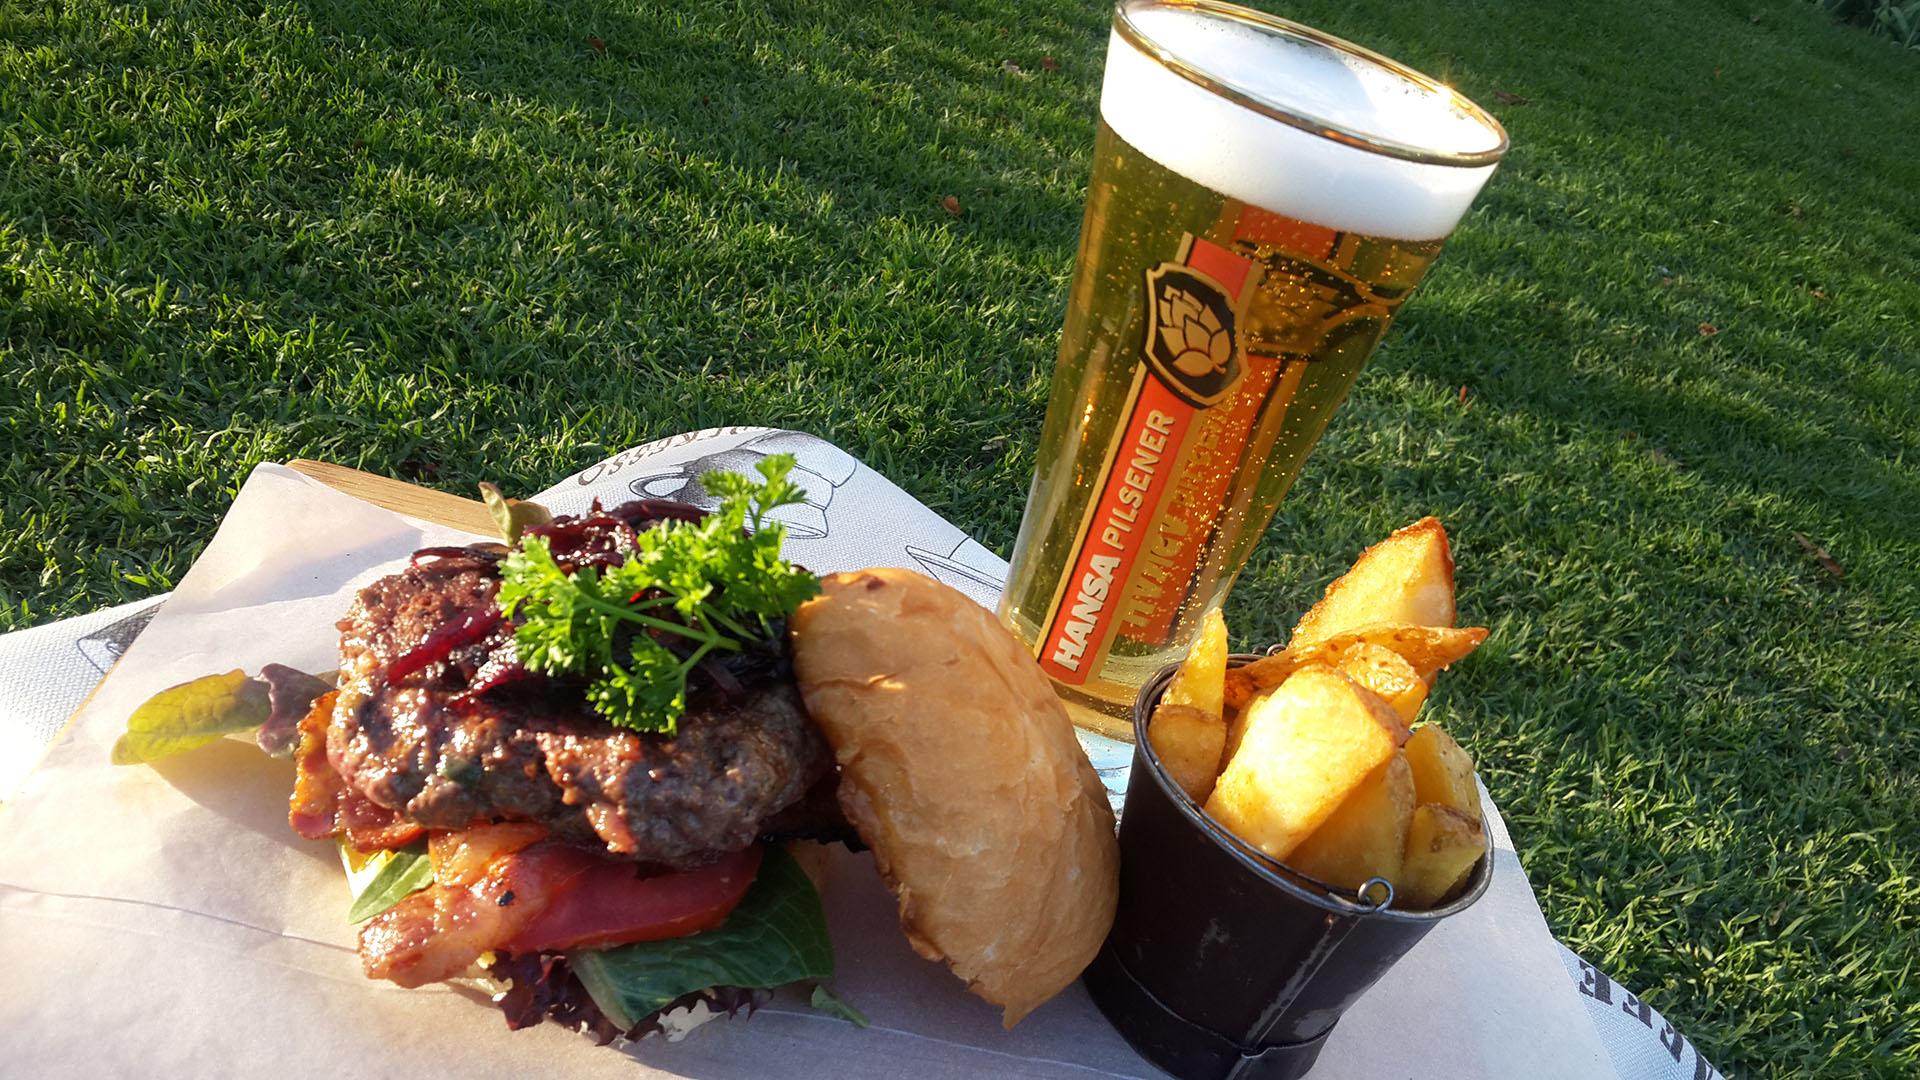 Notties Pub - nottingham-hotel-notties-road-midlands-miander-accommodation-kzn-south-africa-service-pub-grub